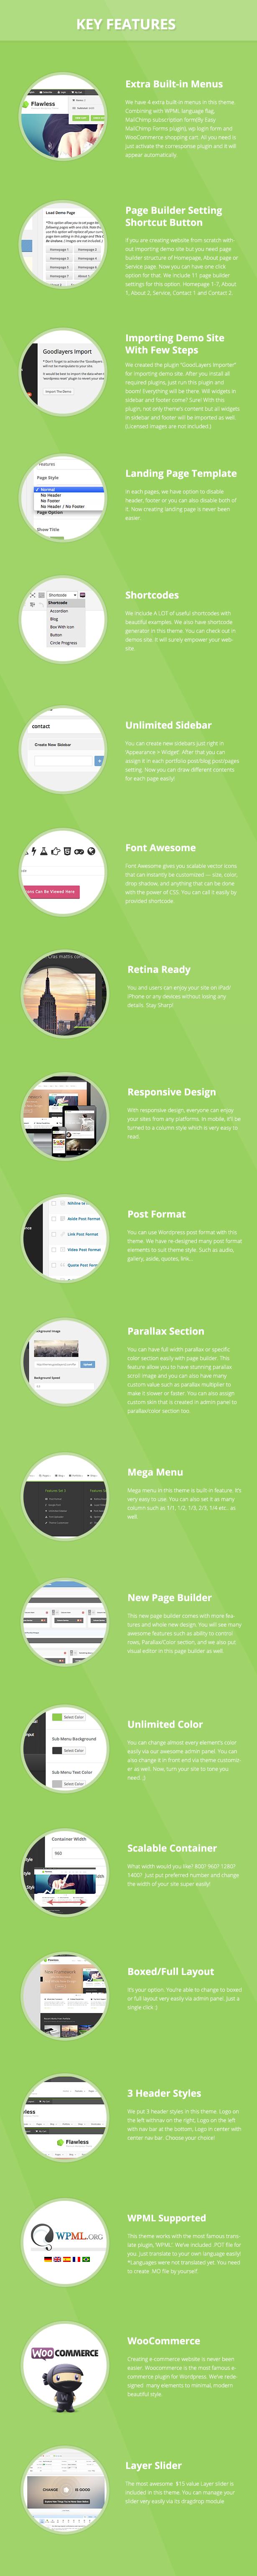 Flawless - Responsive Multi-Purpose WP Theme - 2